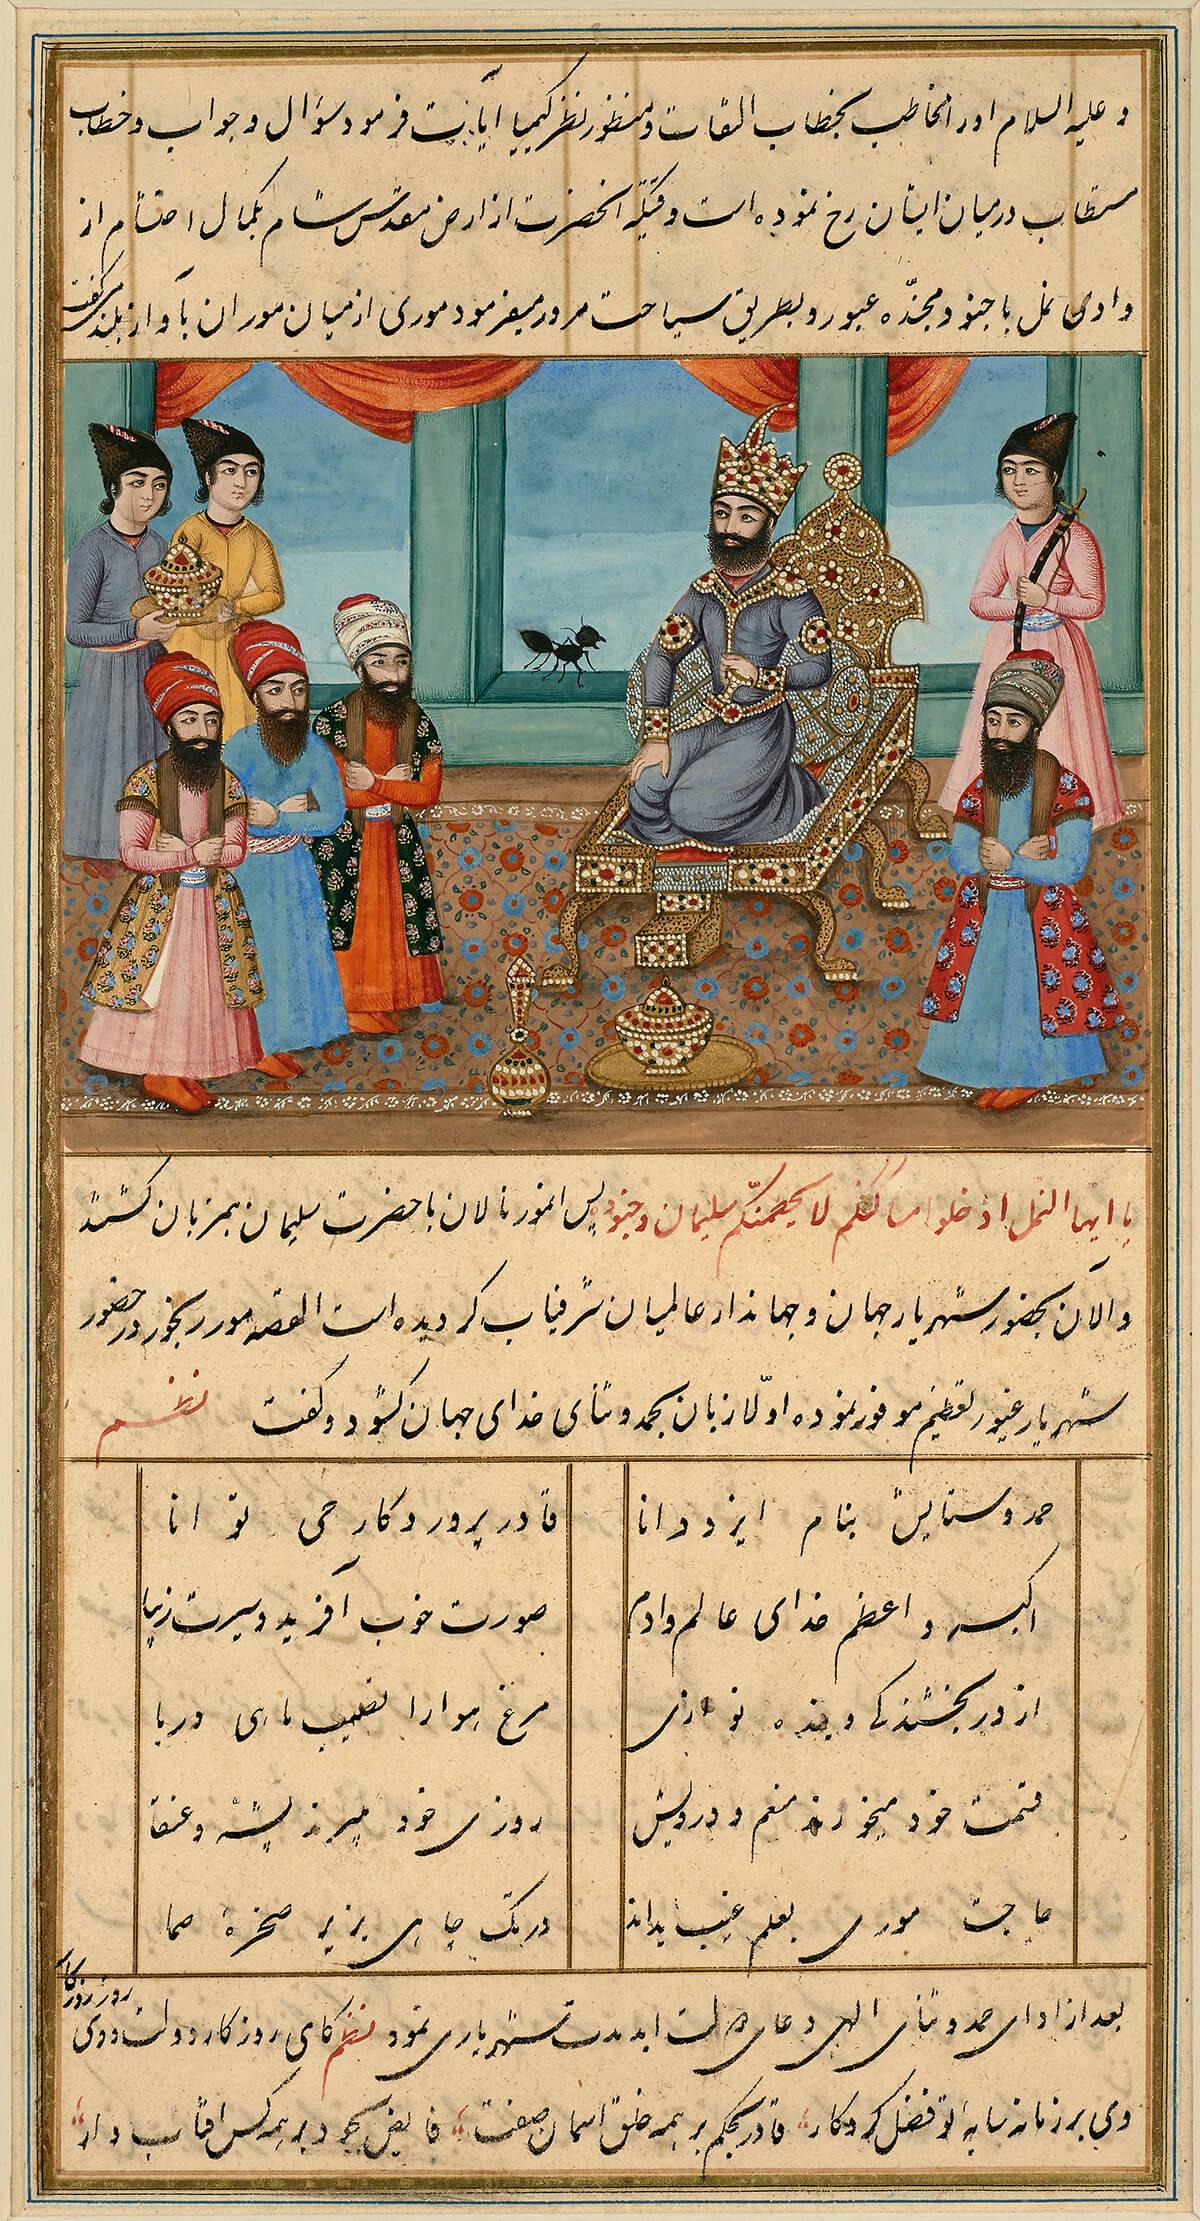 King Salomon and the ant - Illustrated folio from a Qajar Anvar-i Suhaili